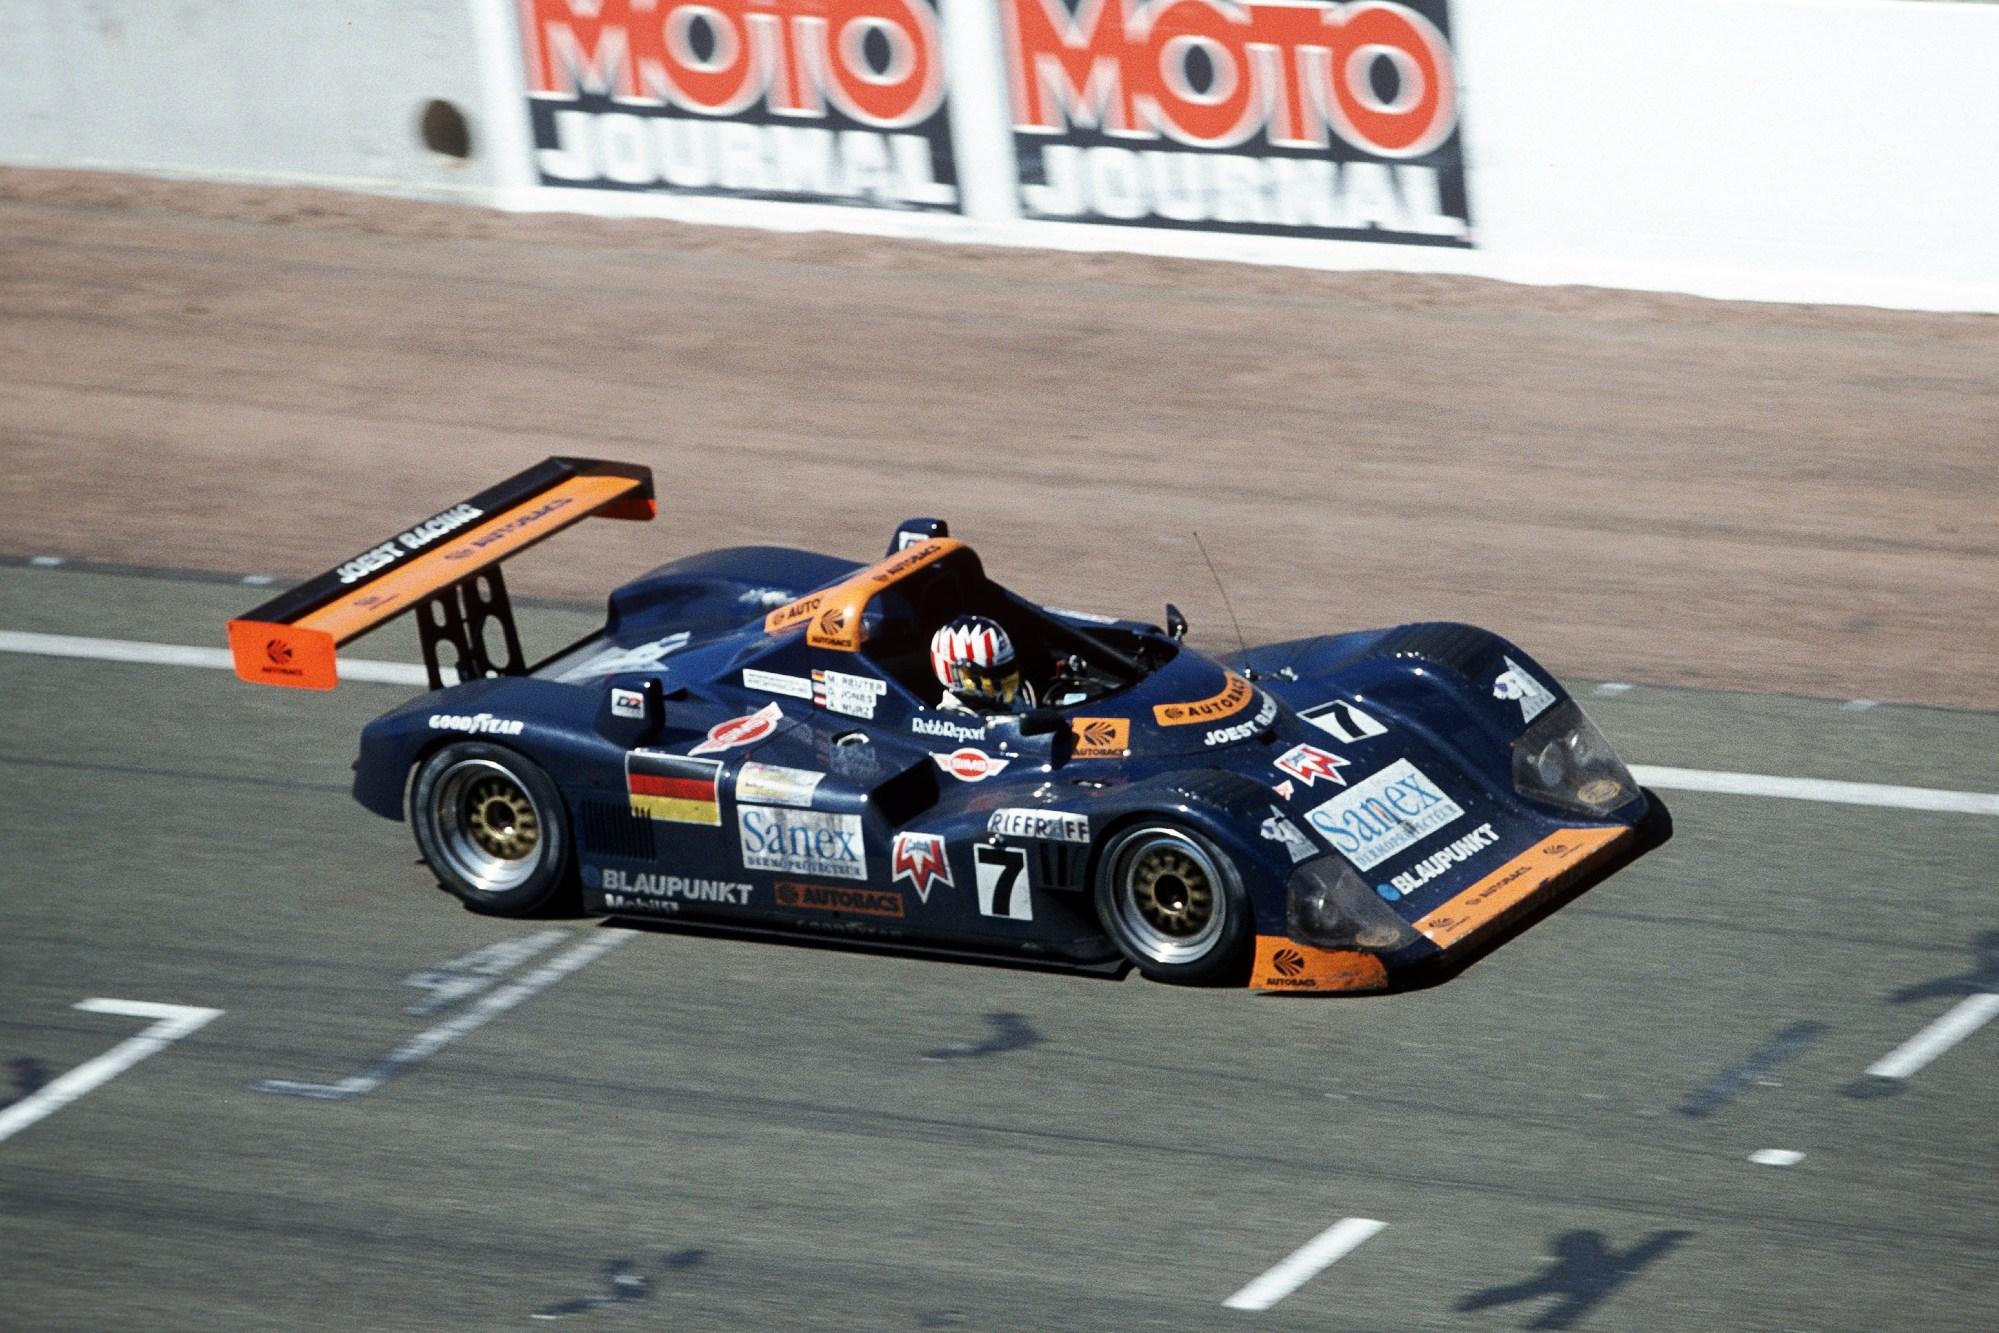 Porsche WSC Spyder, 1996 Le Mans